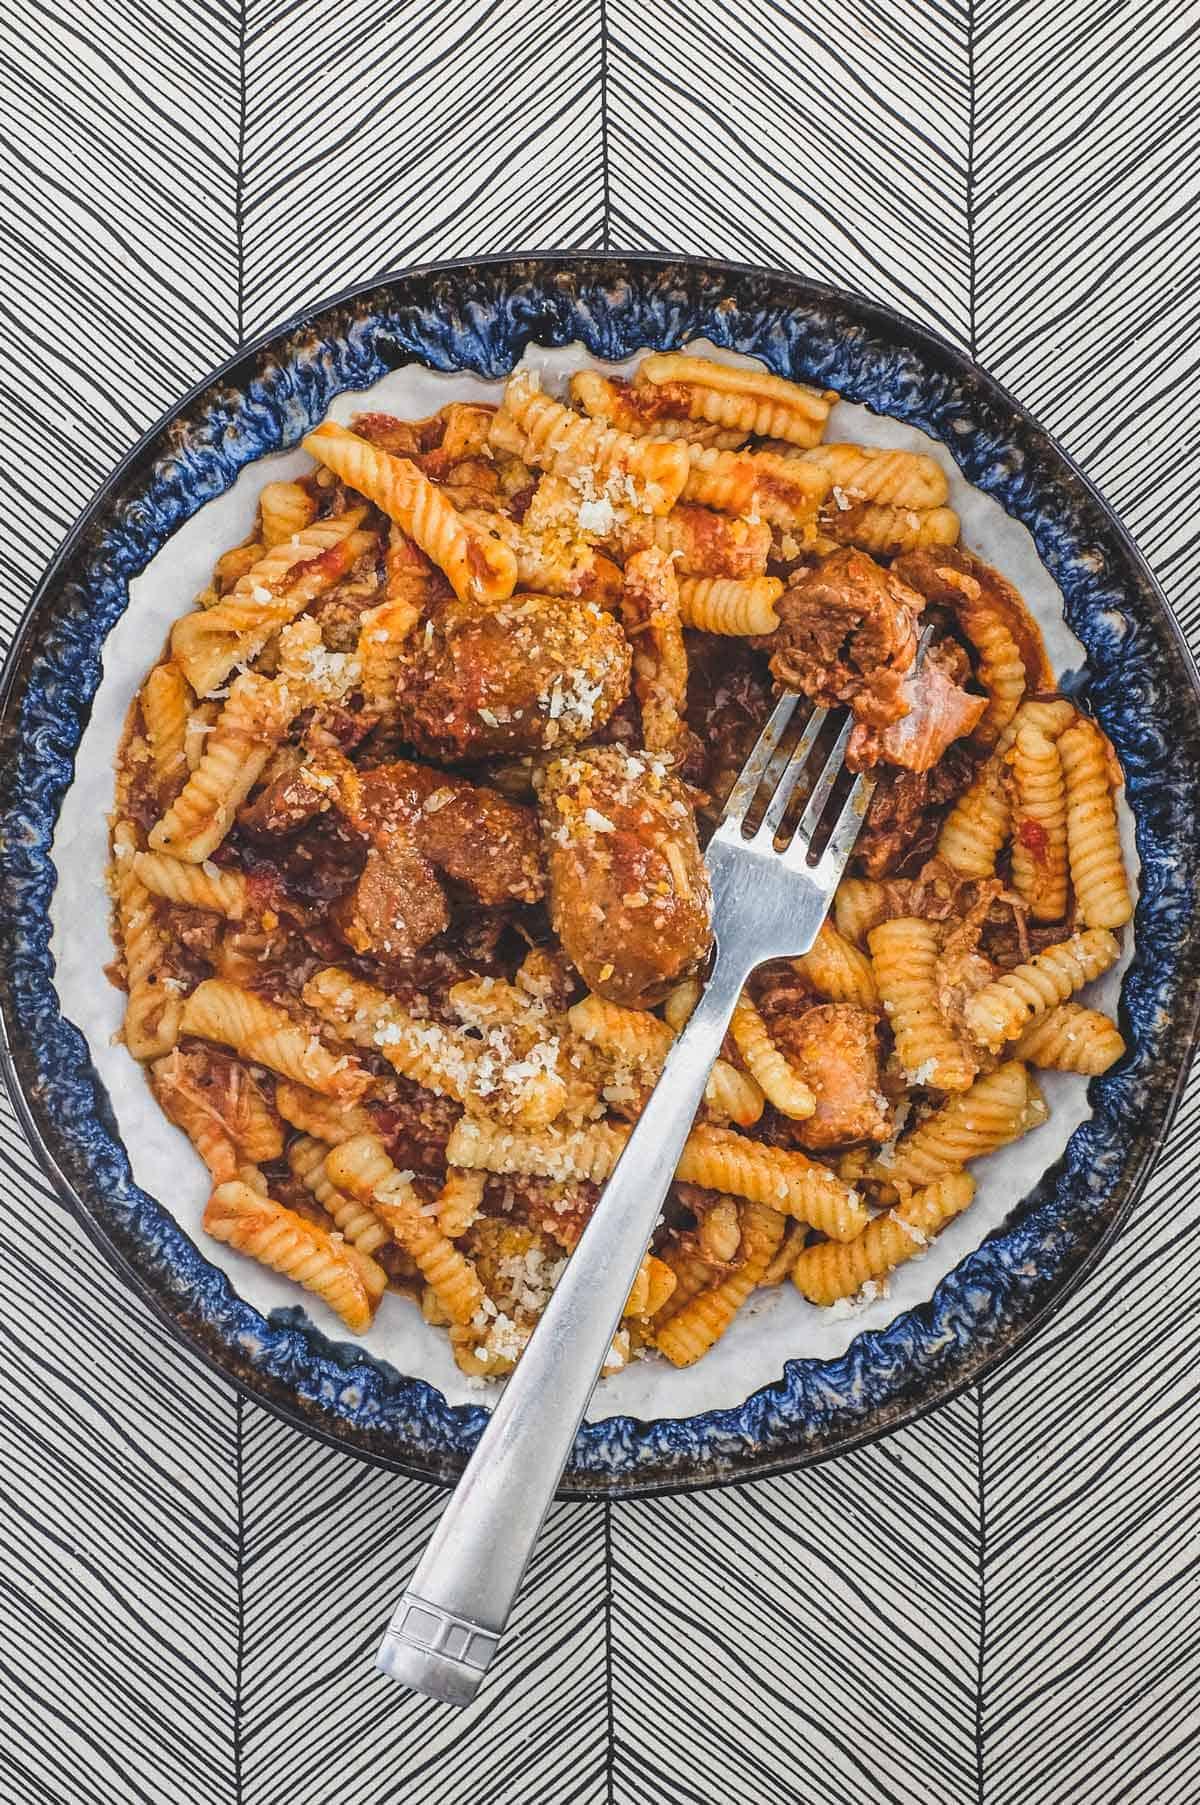 Cavatelli with Pork Ragù